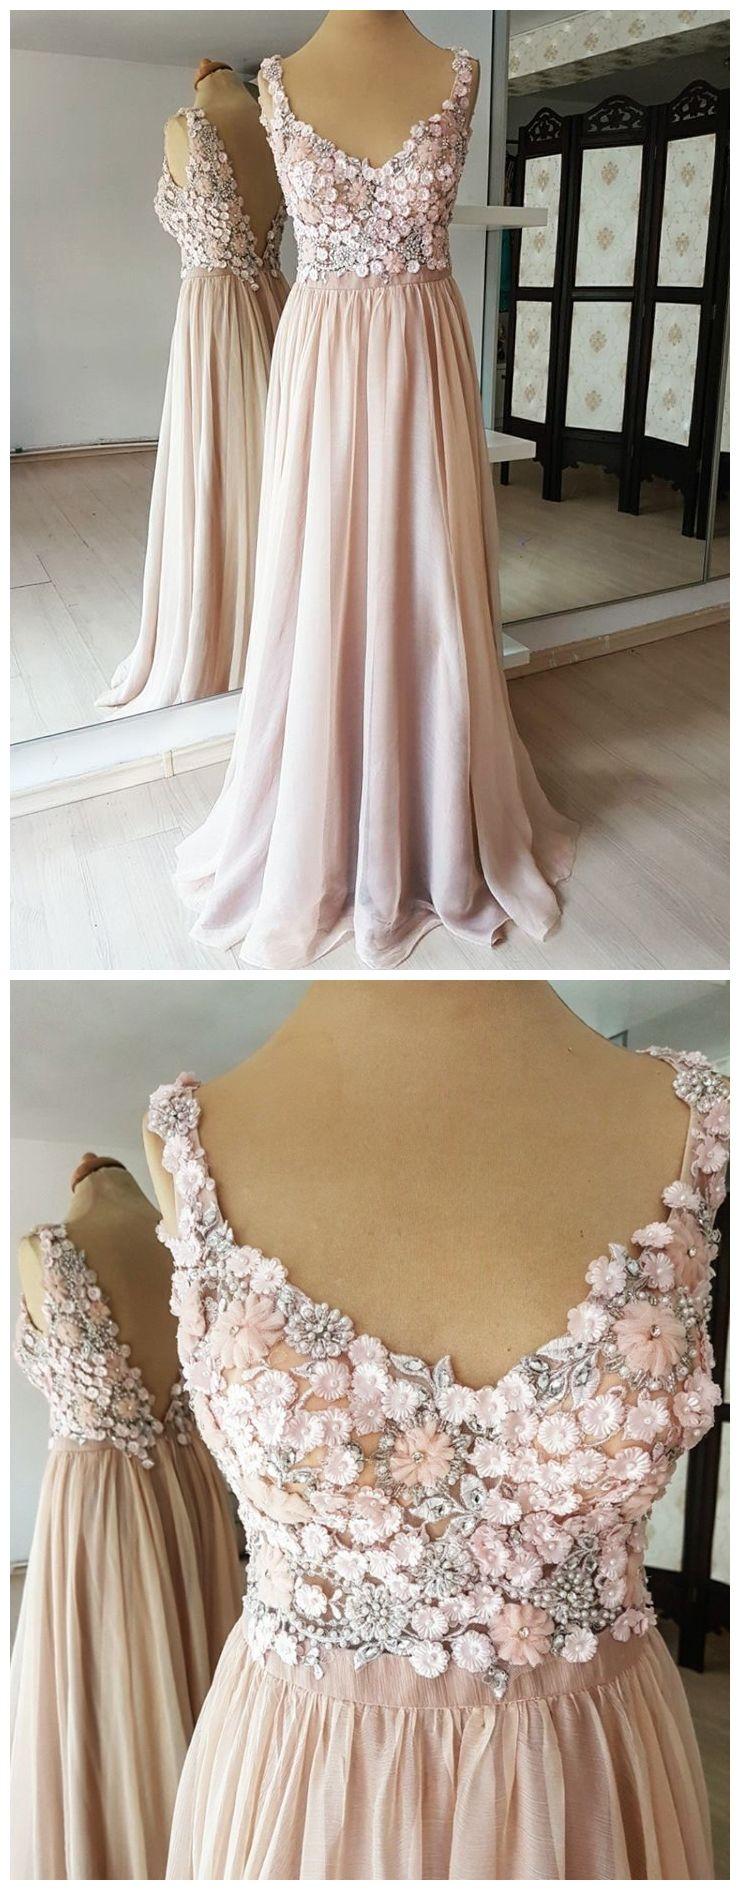 Blush pink long prom dresses flower applique beaded backless formal